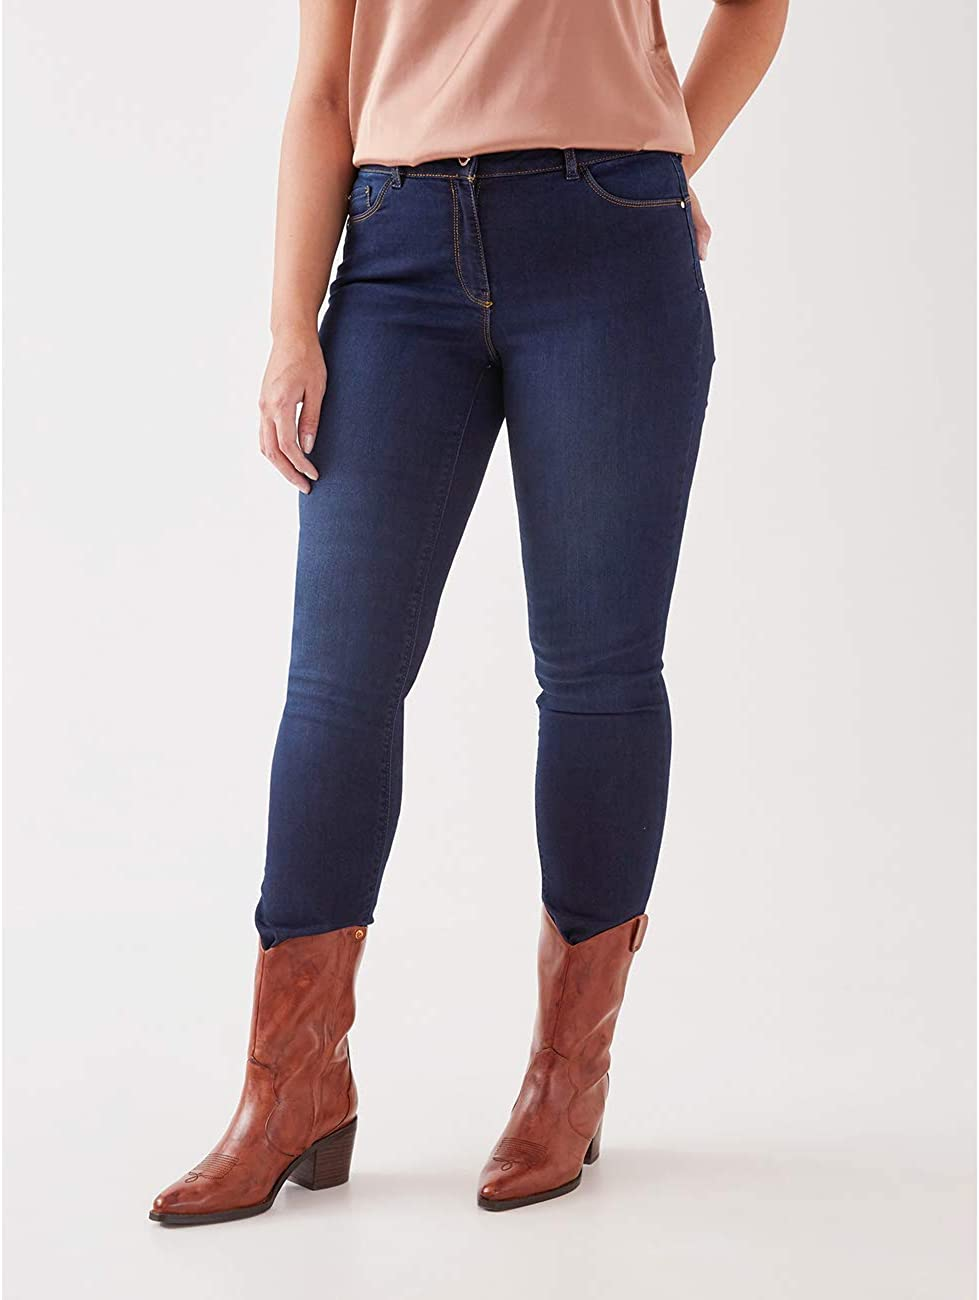 Italian Plus Size Fiorella Rubino Jeans Skinny Dark Blu Washed